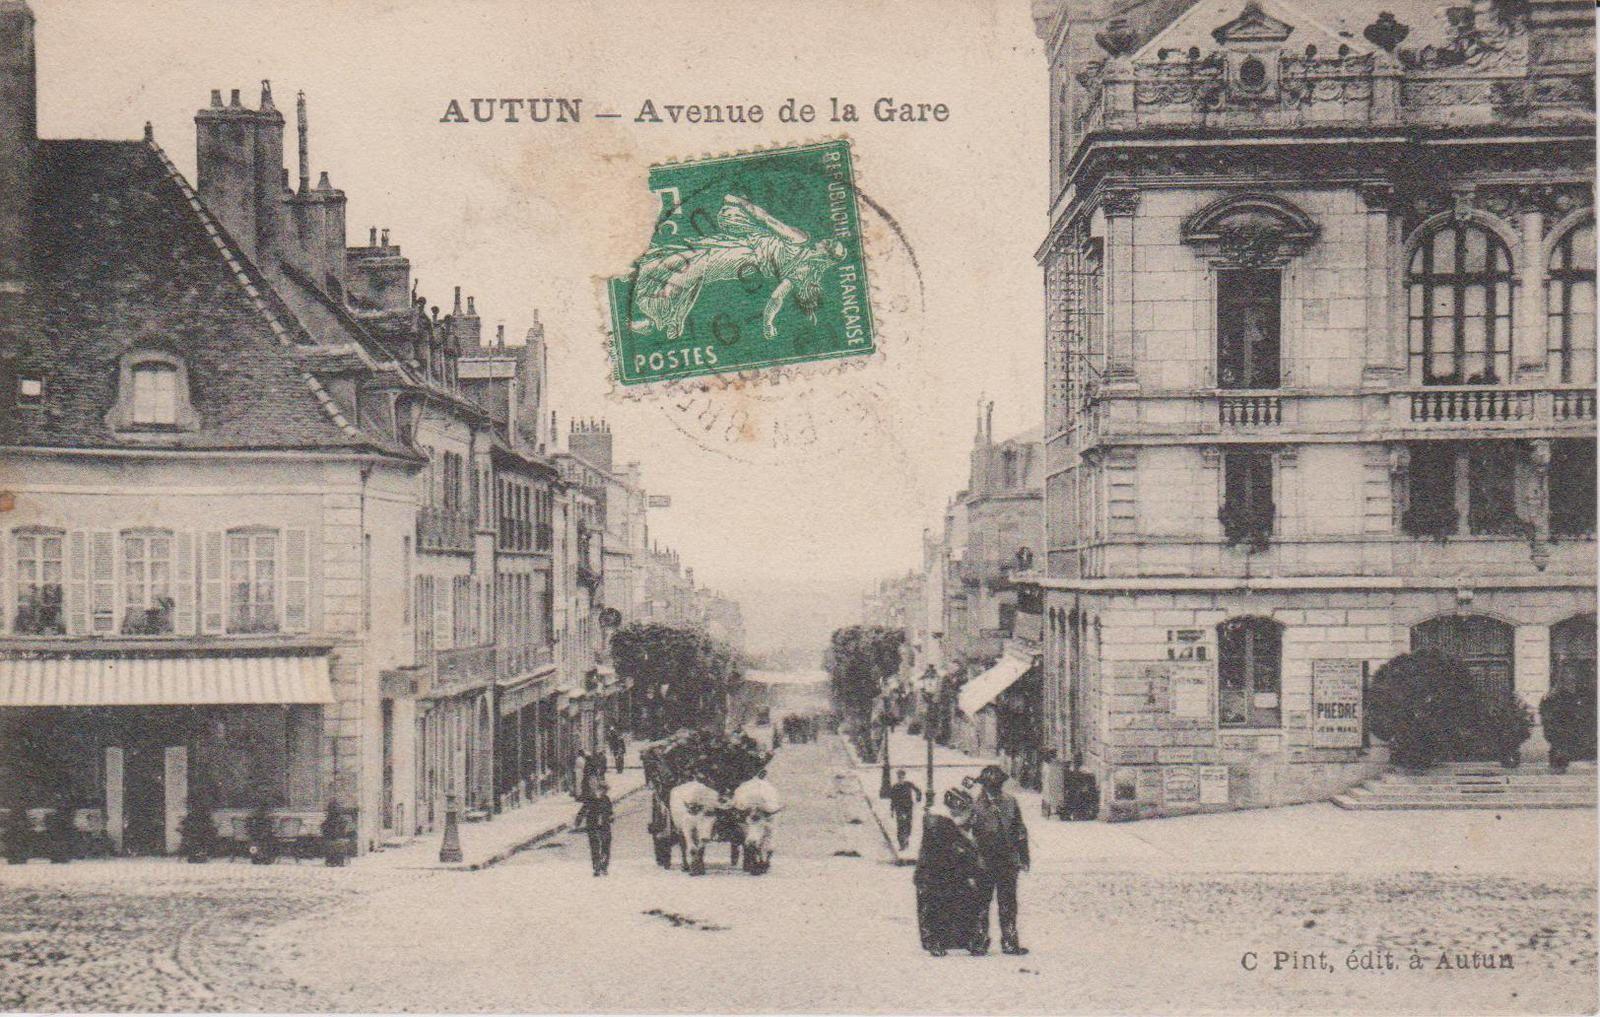 Avenue Charles de Gaulle - 71400 Autun.